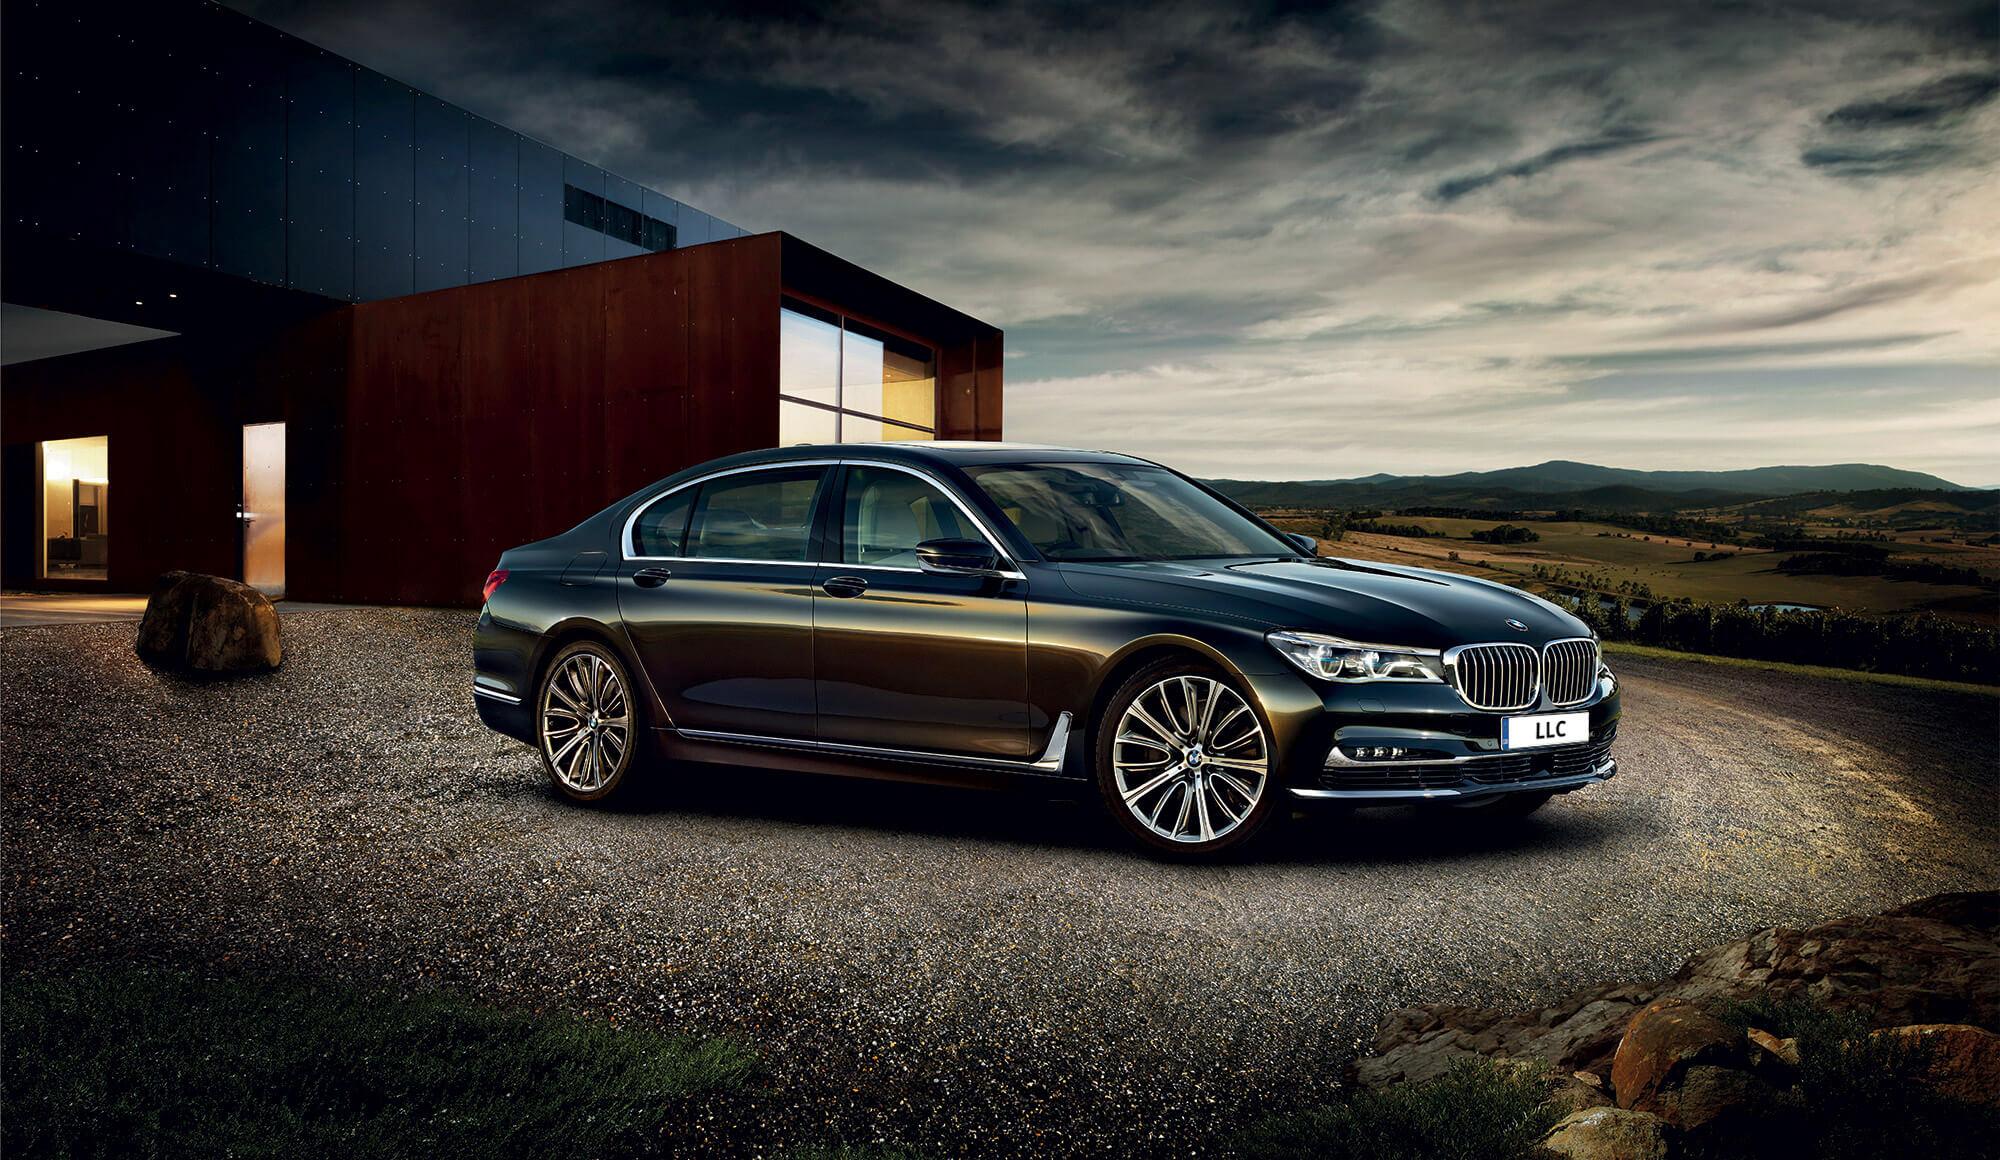 BMW Landscape Background